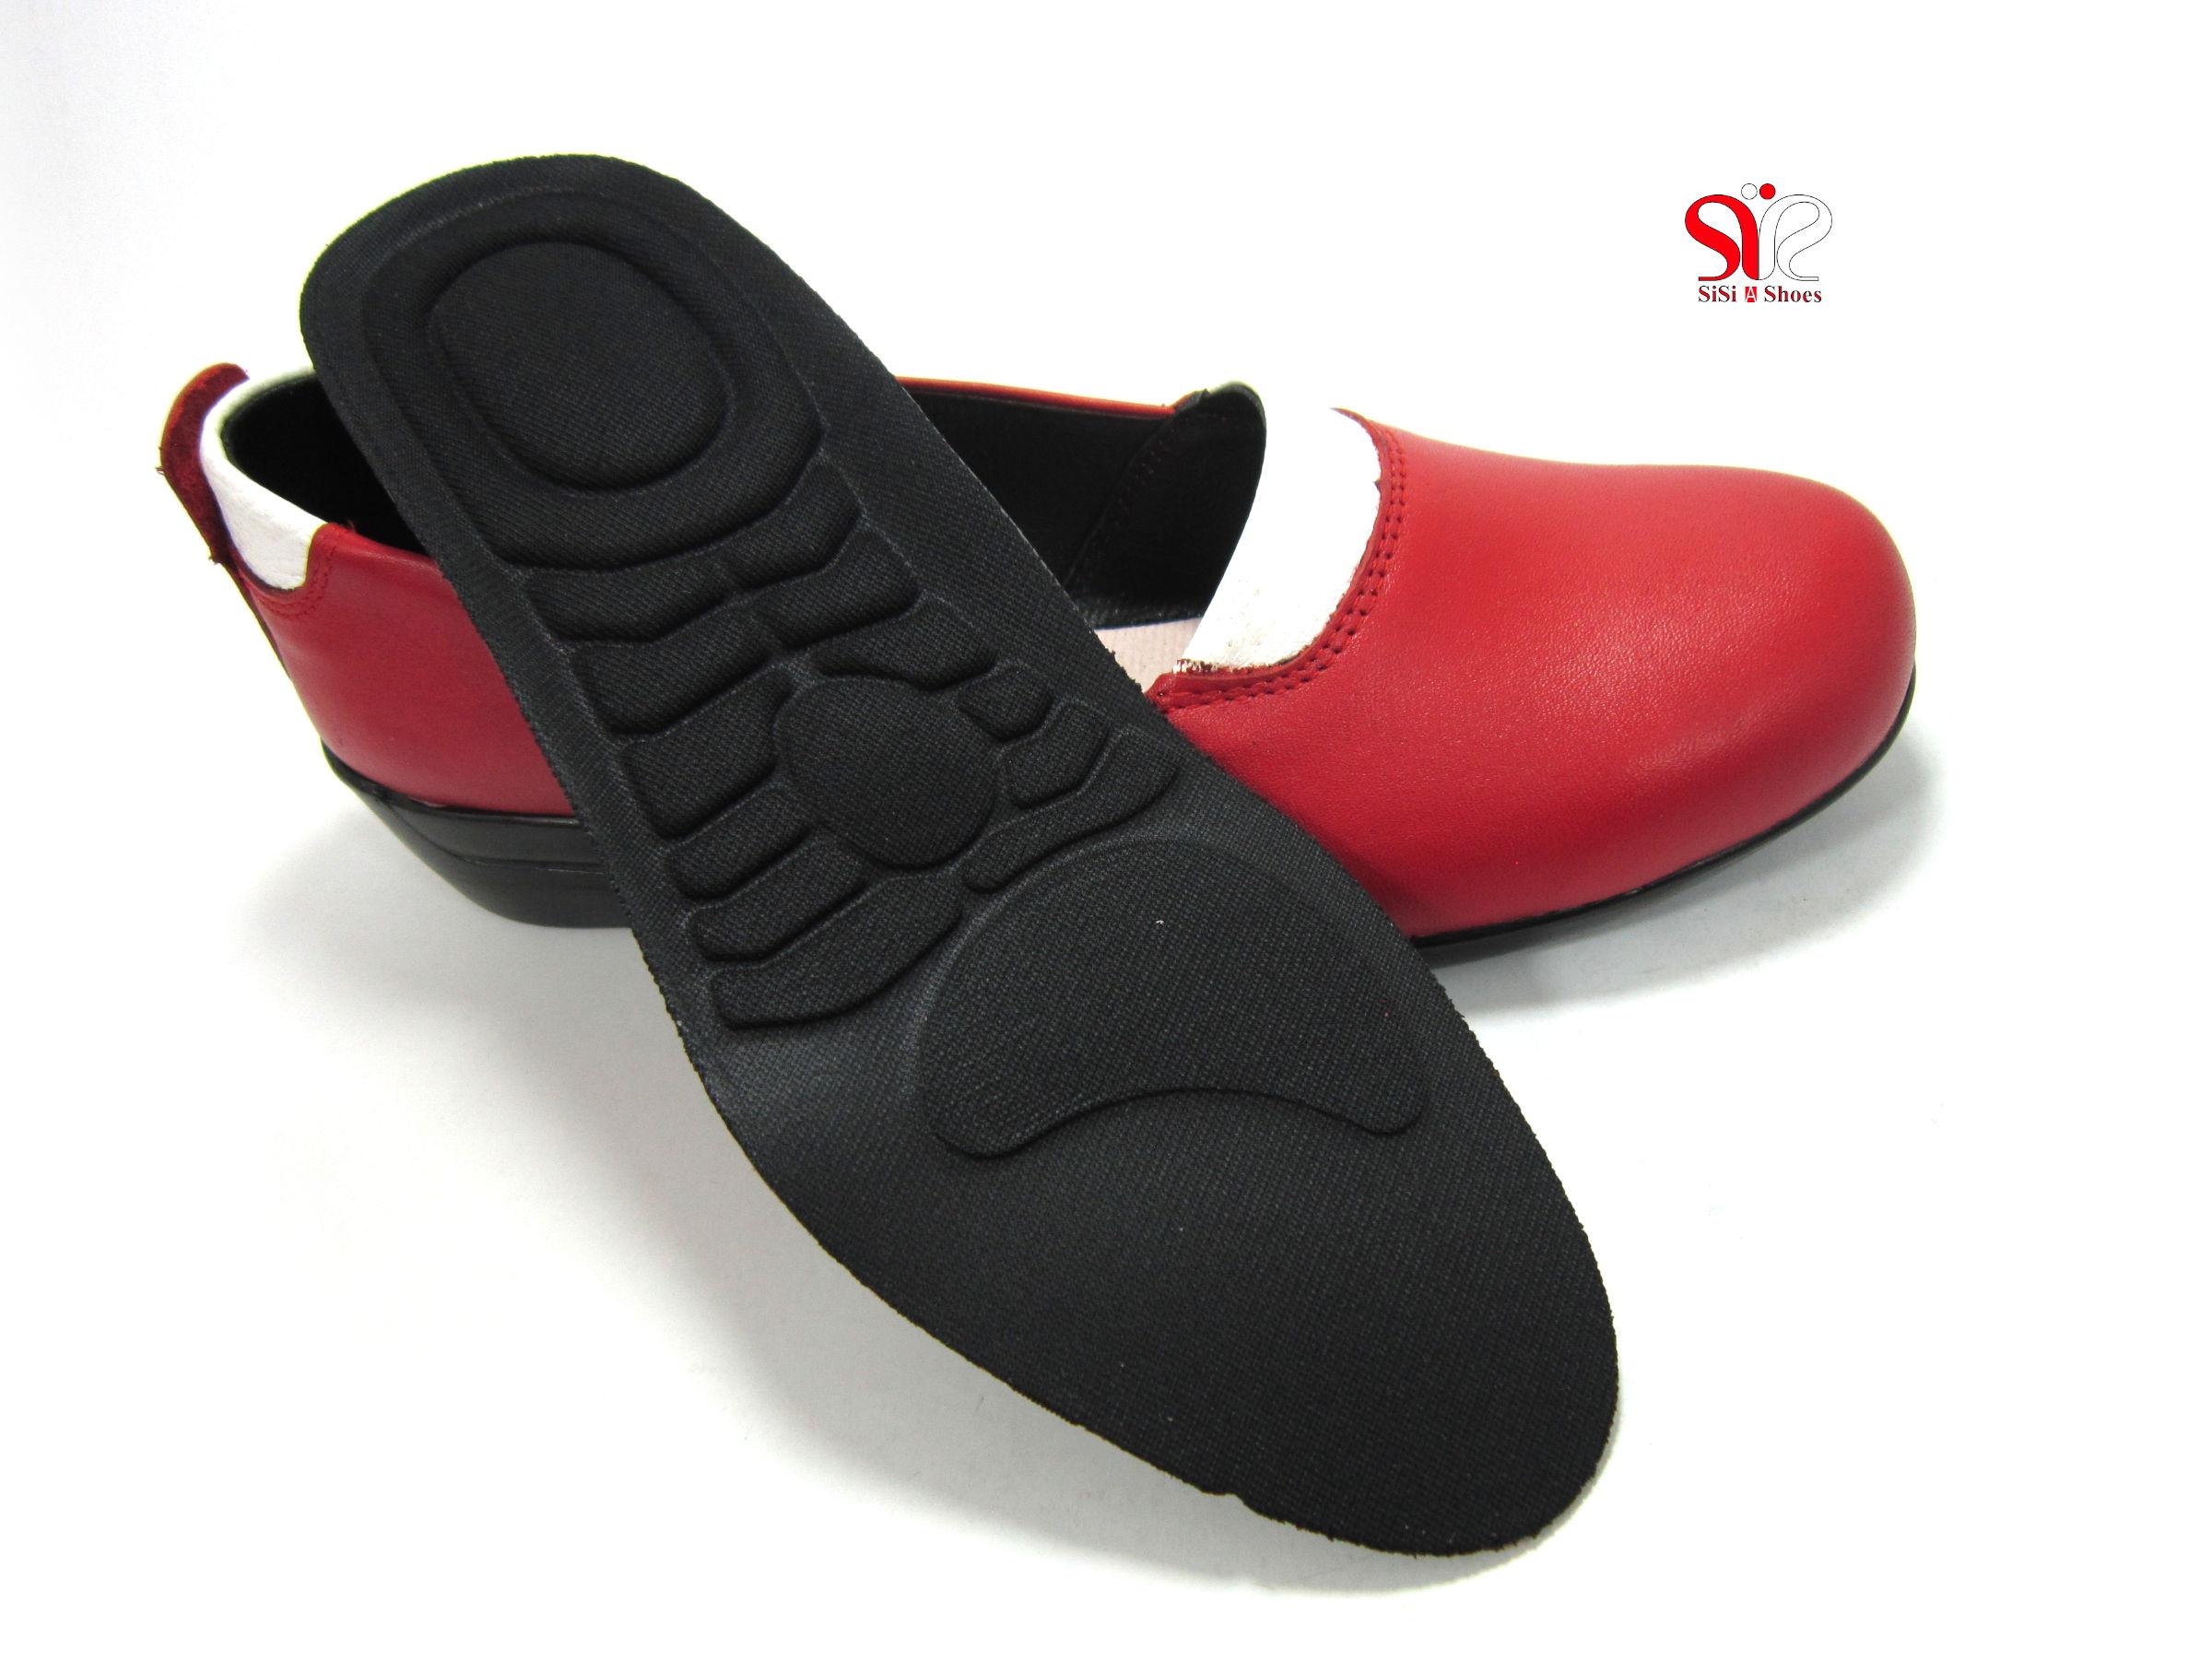 کف طبی و قابل تعویض کفش زنانه مدل آدریانا رنگ قرمز - کفش زنانه سی سی